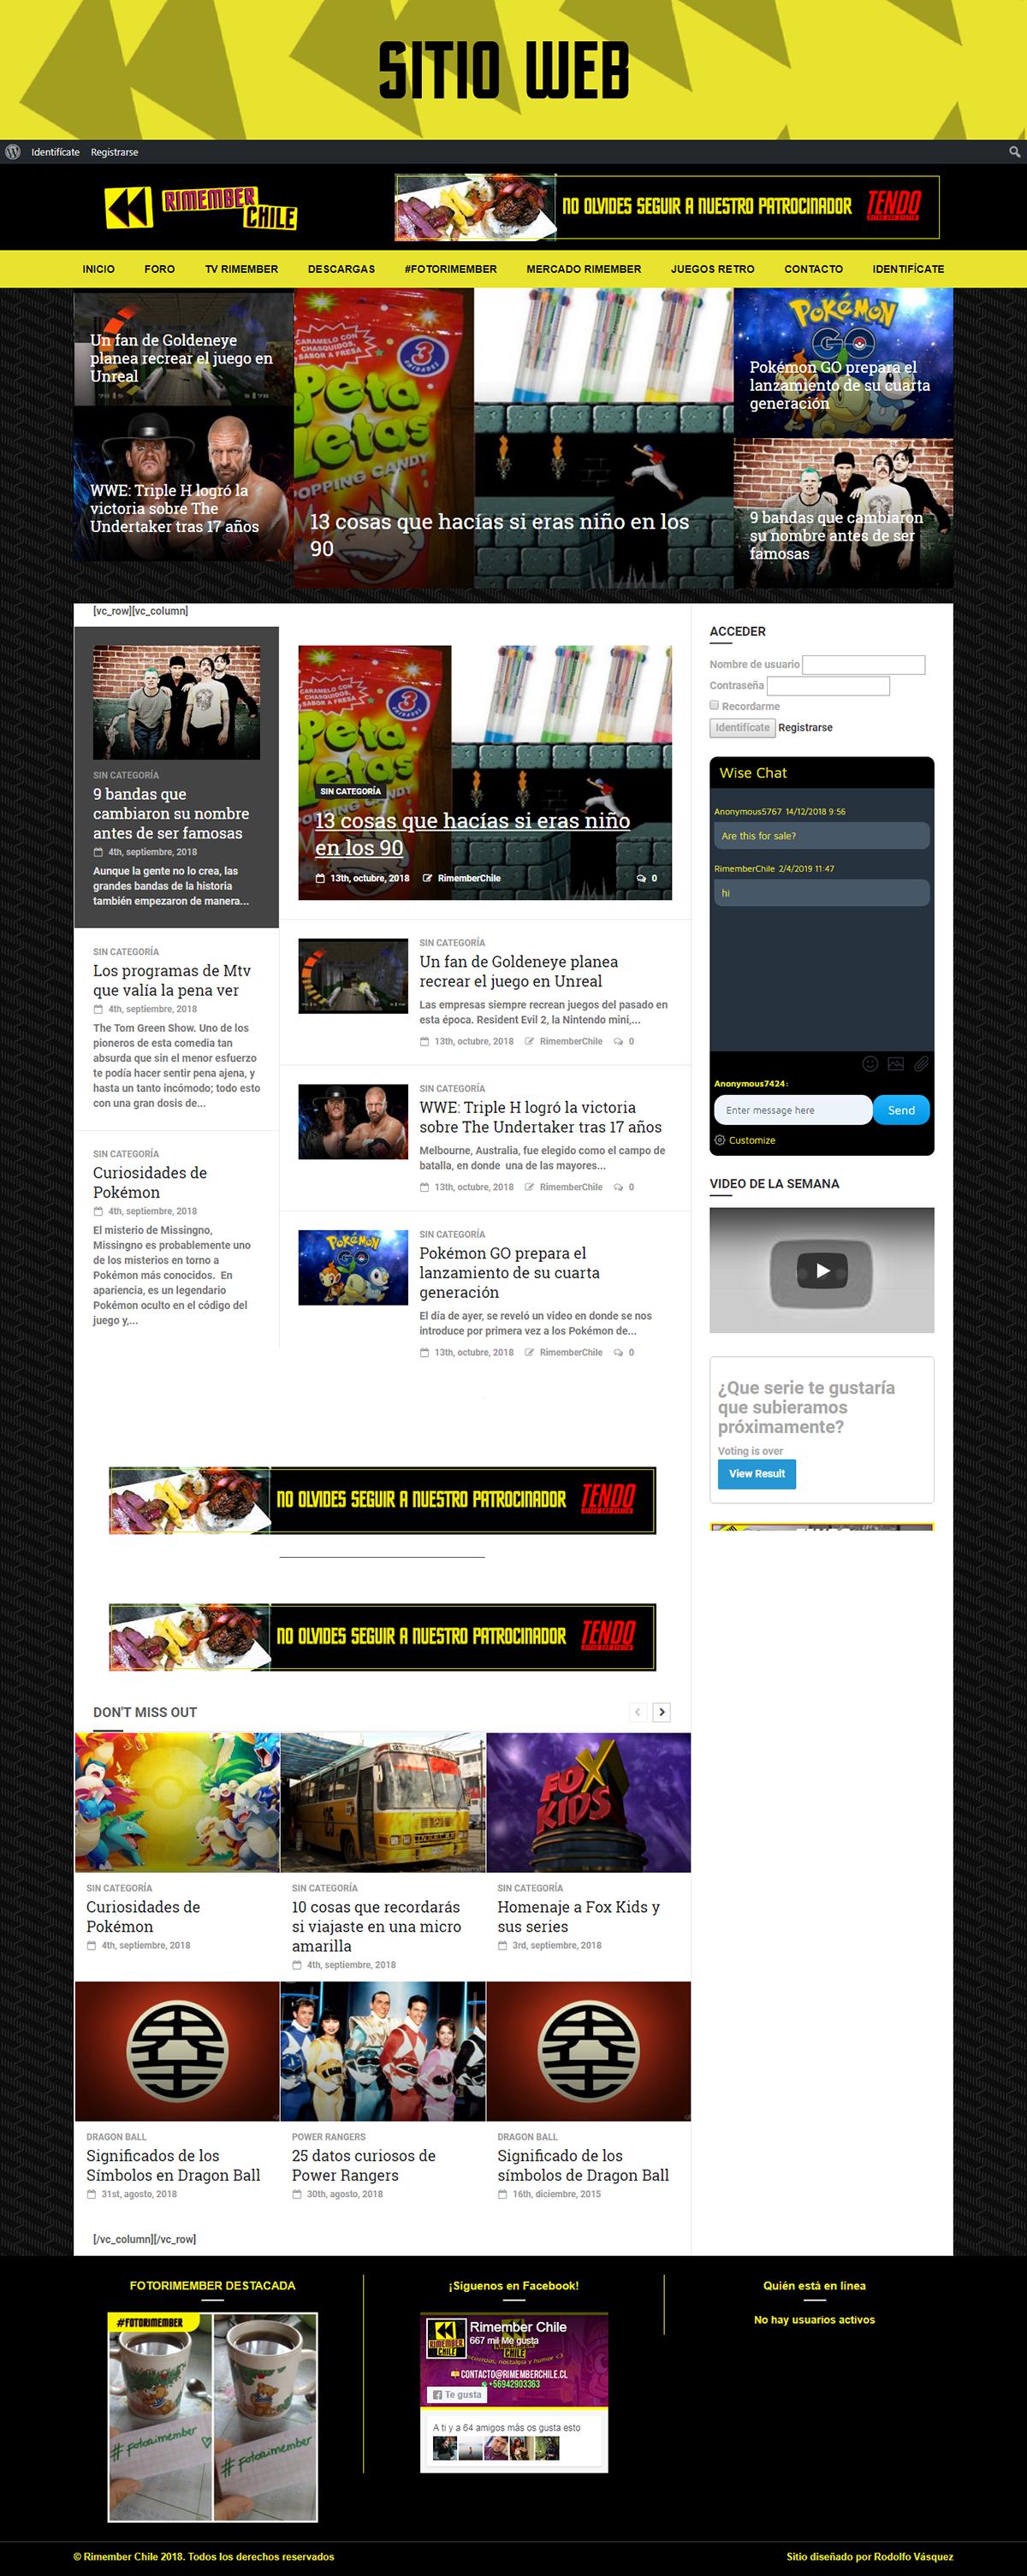 Retro oldschool Web photoshop wordpress Project remember chile recuerdos nostalgia